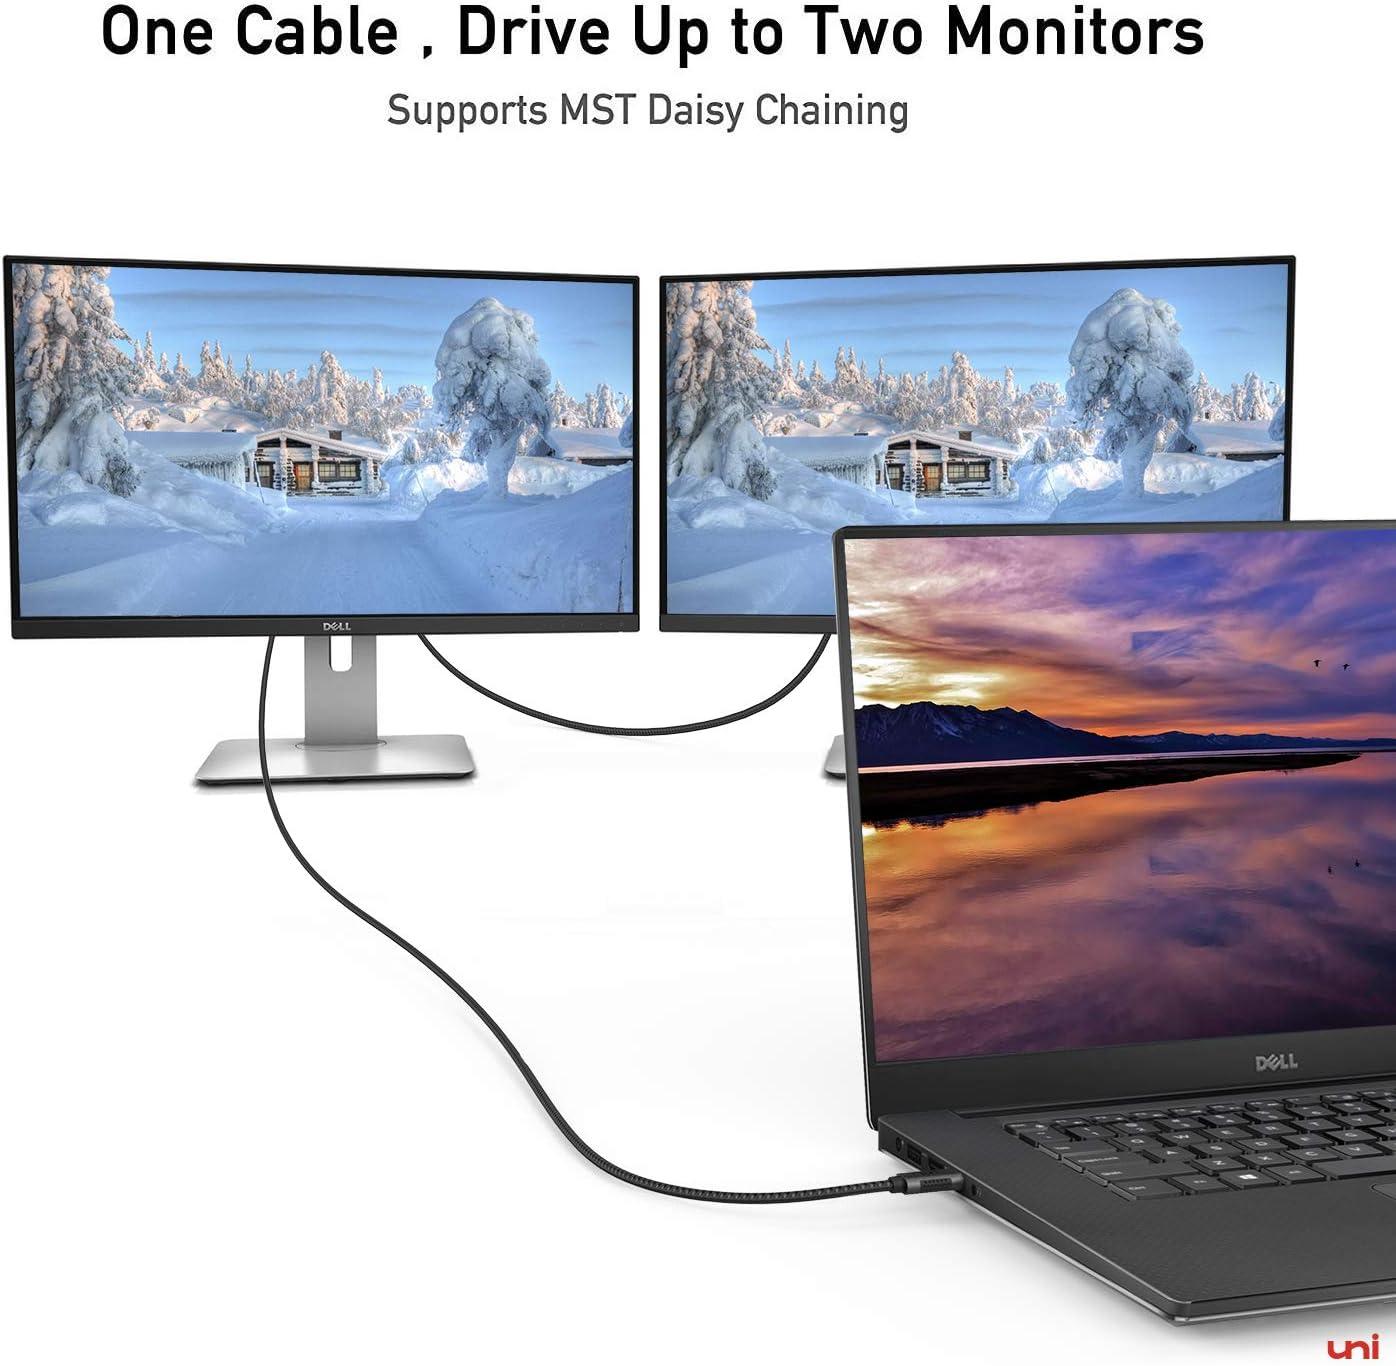 Gray XPS 15 USB C to DisplayPort Cable 3ft MacBook Air//iPad Pro 2018 4K@60Hz, 2K@165Hz uni Thunderbolt 3 to DisplayPort Cable Compatible for MacBook Pro 2019//2018//2017 Surface Book 2